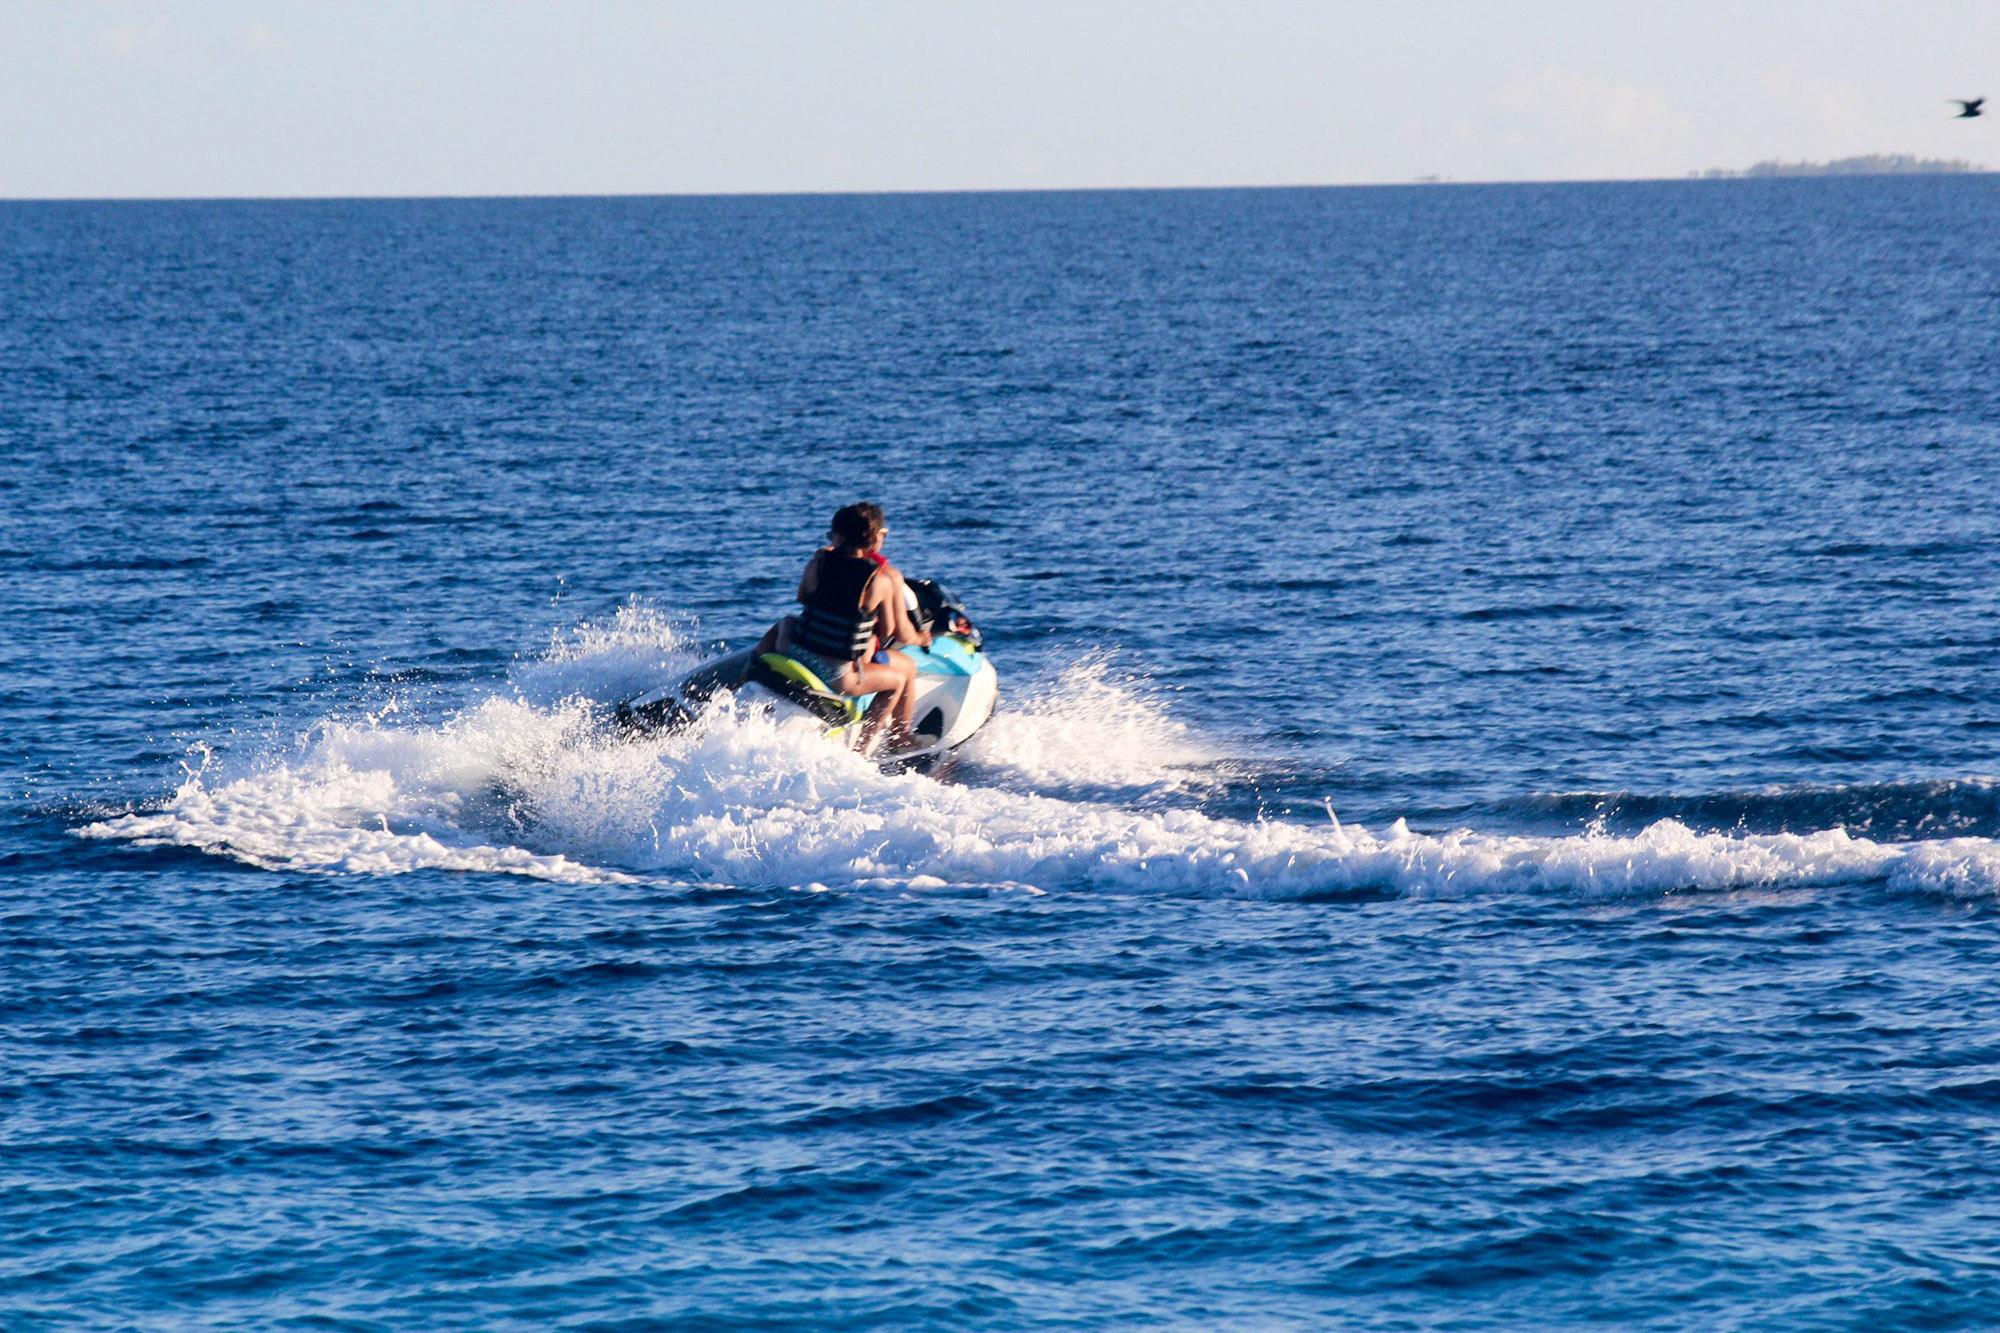 Fakarava, aventure privatisée en jet-ski.